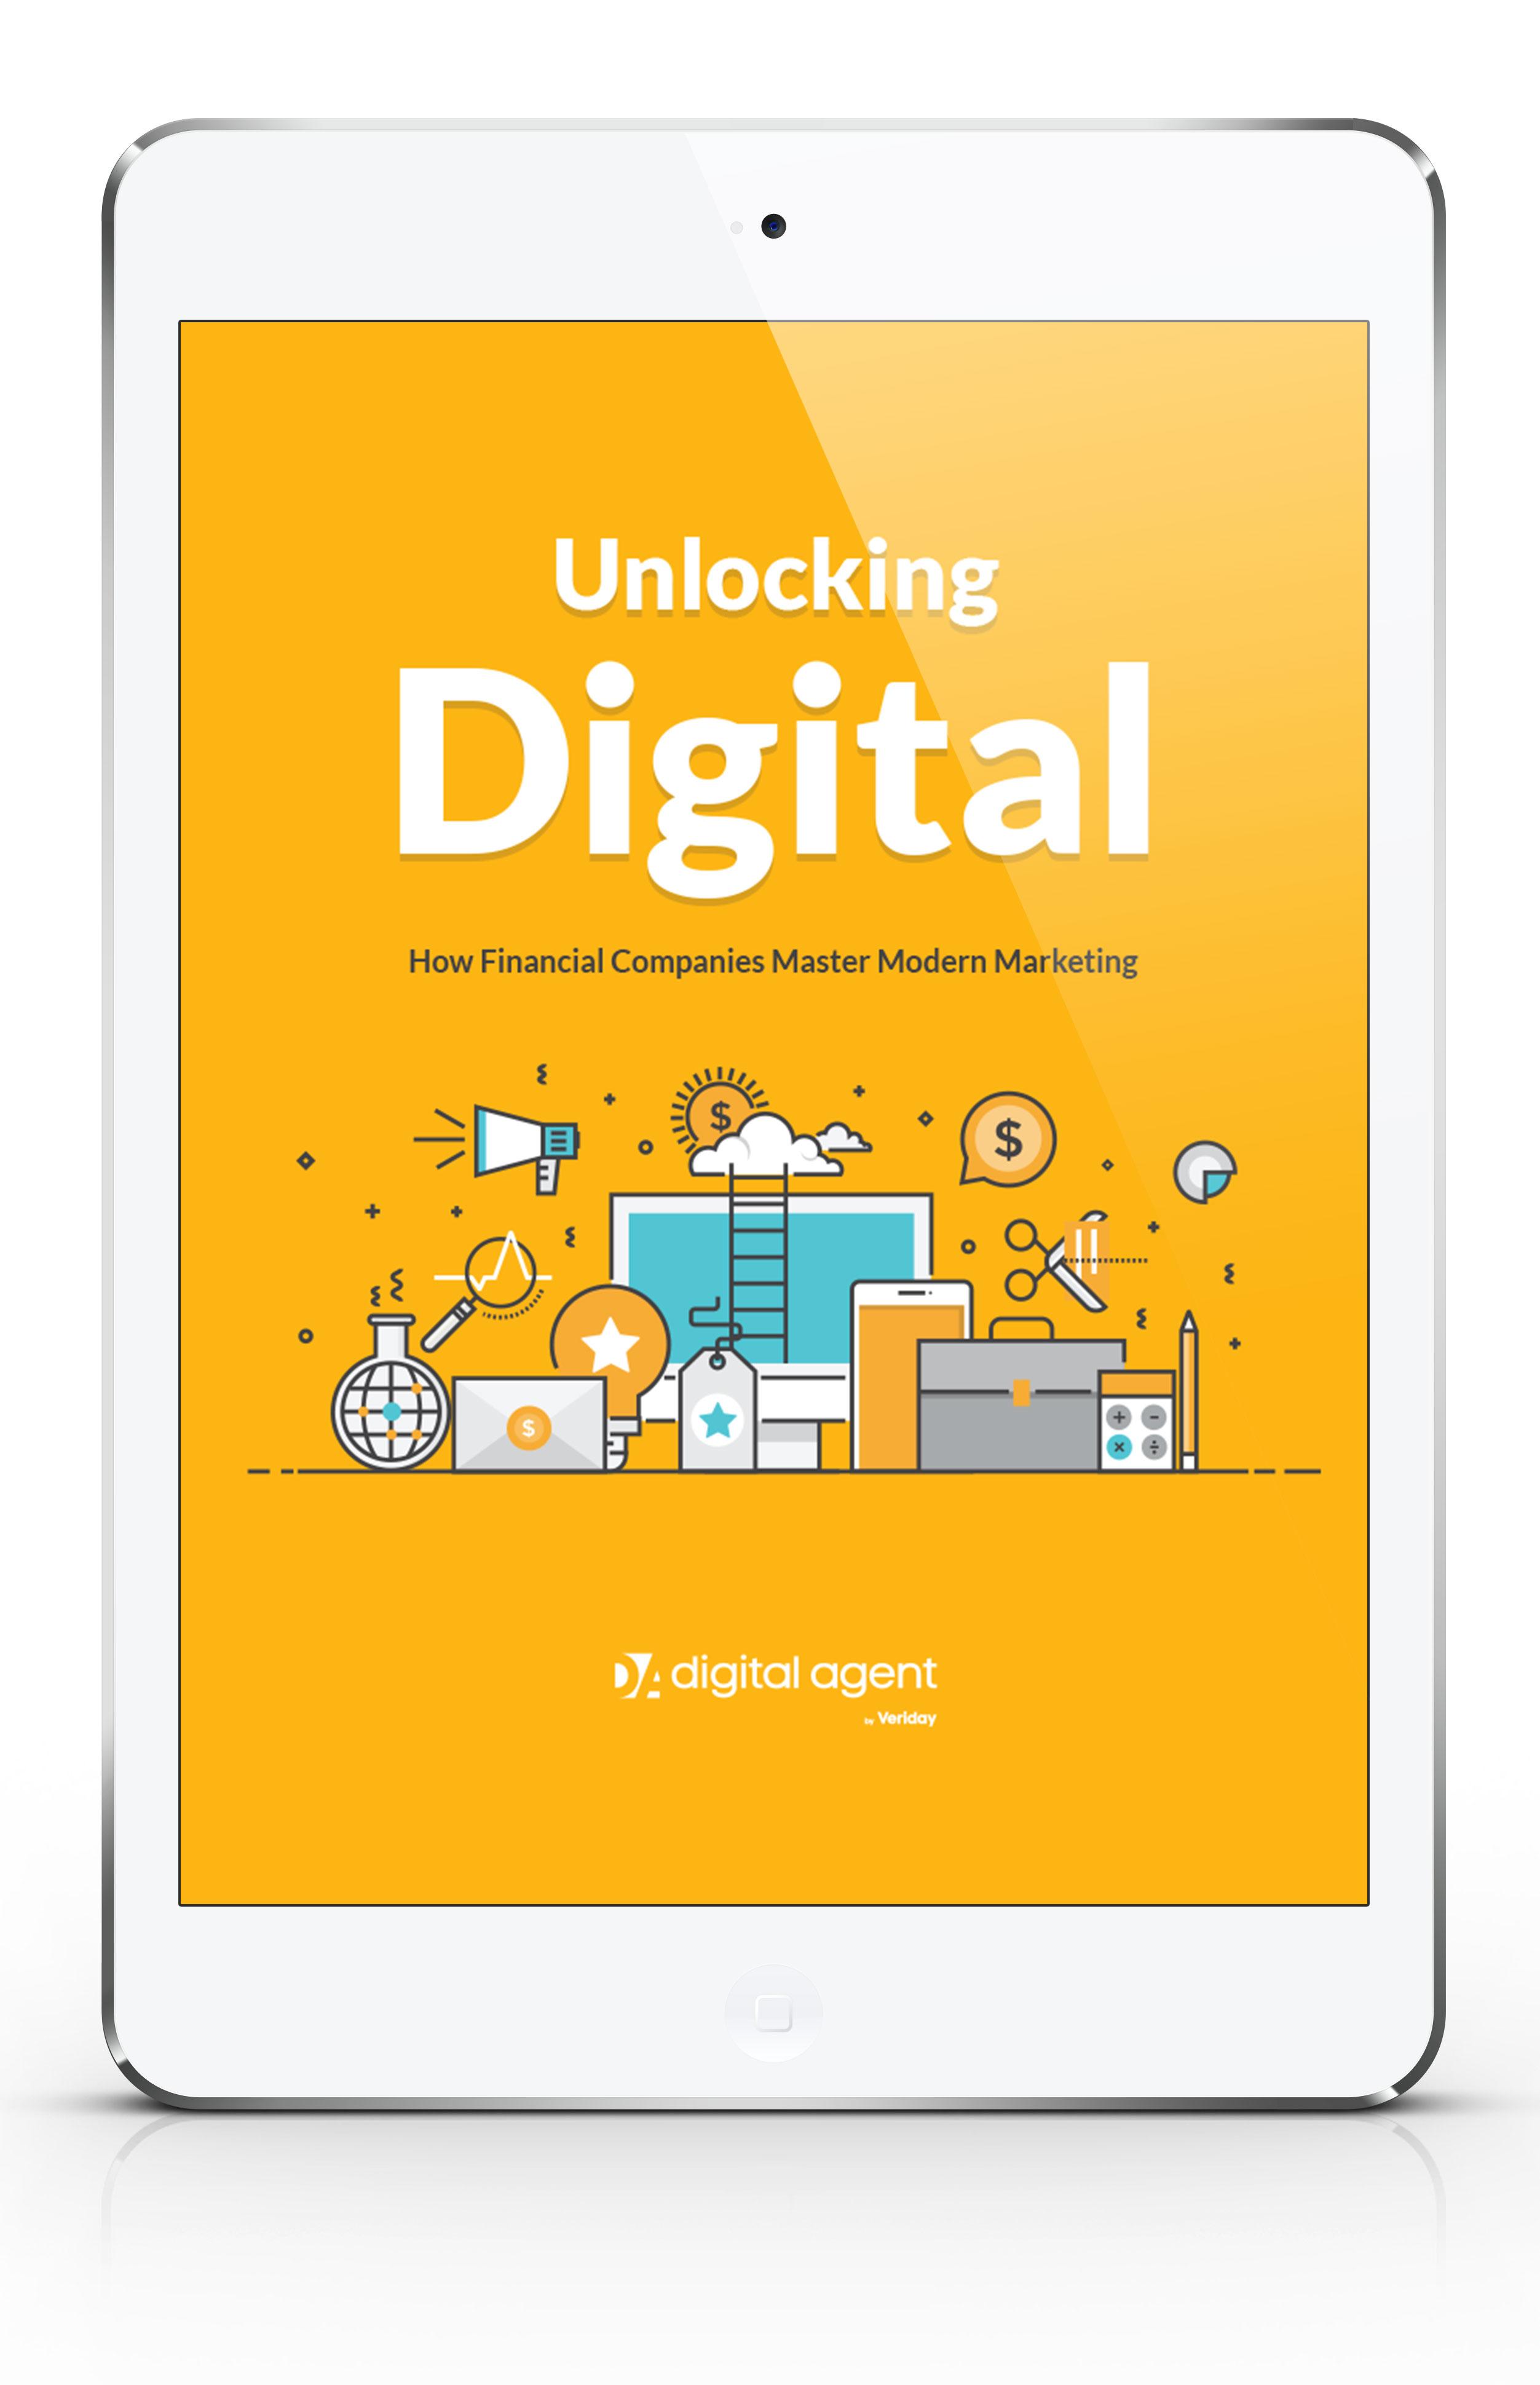 Unlocking Digital: How Financial Companies Master Modern Marketing